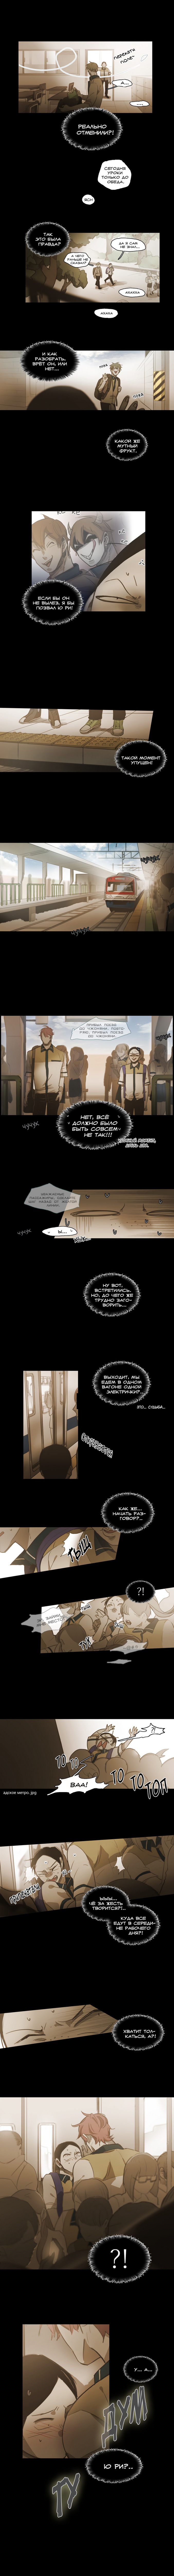 https://r1.ninemanga.com/comics/pic2/31/28127/304057/1466464645441.jpg Page 3